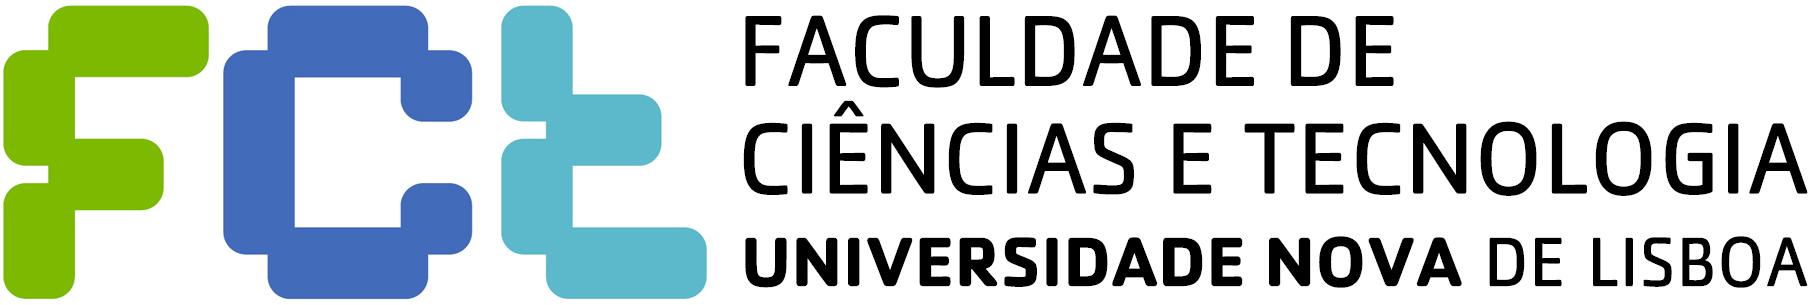 FCT-UNL